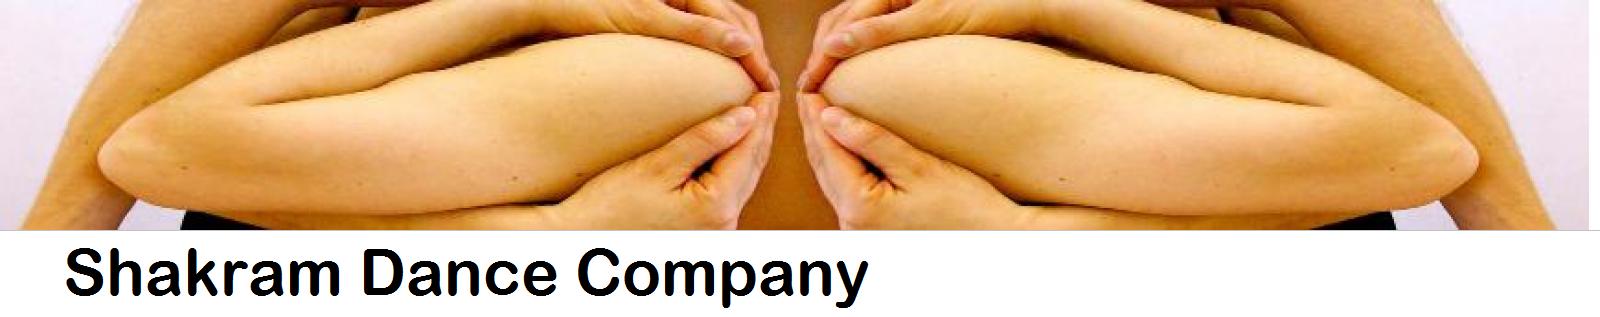 Shakram Dance Company logo